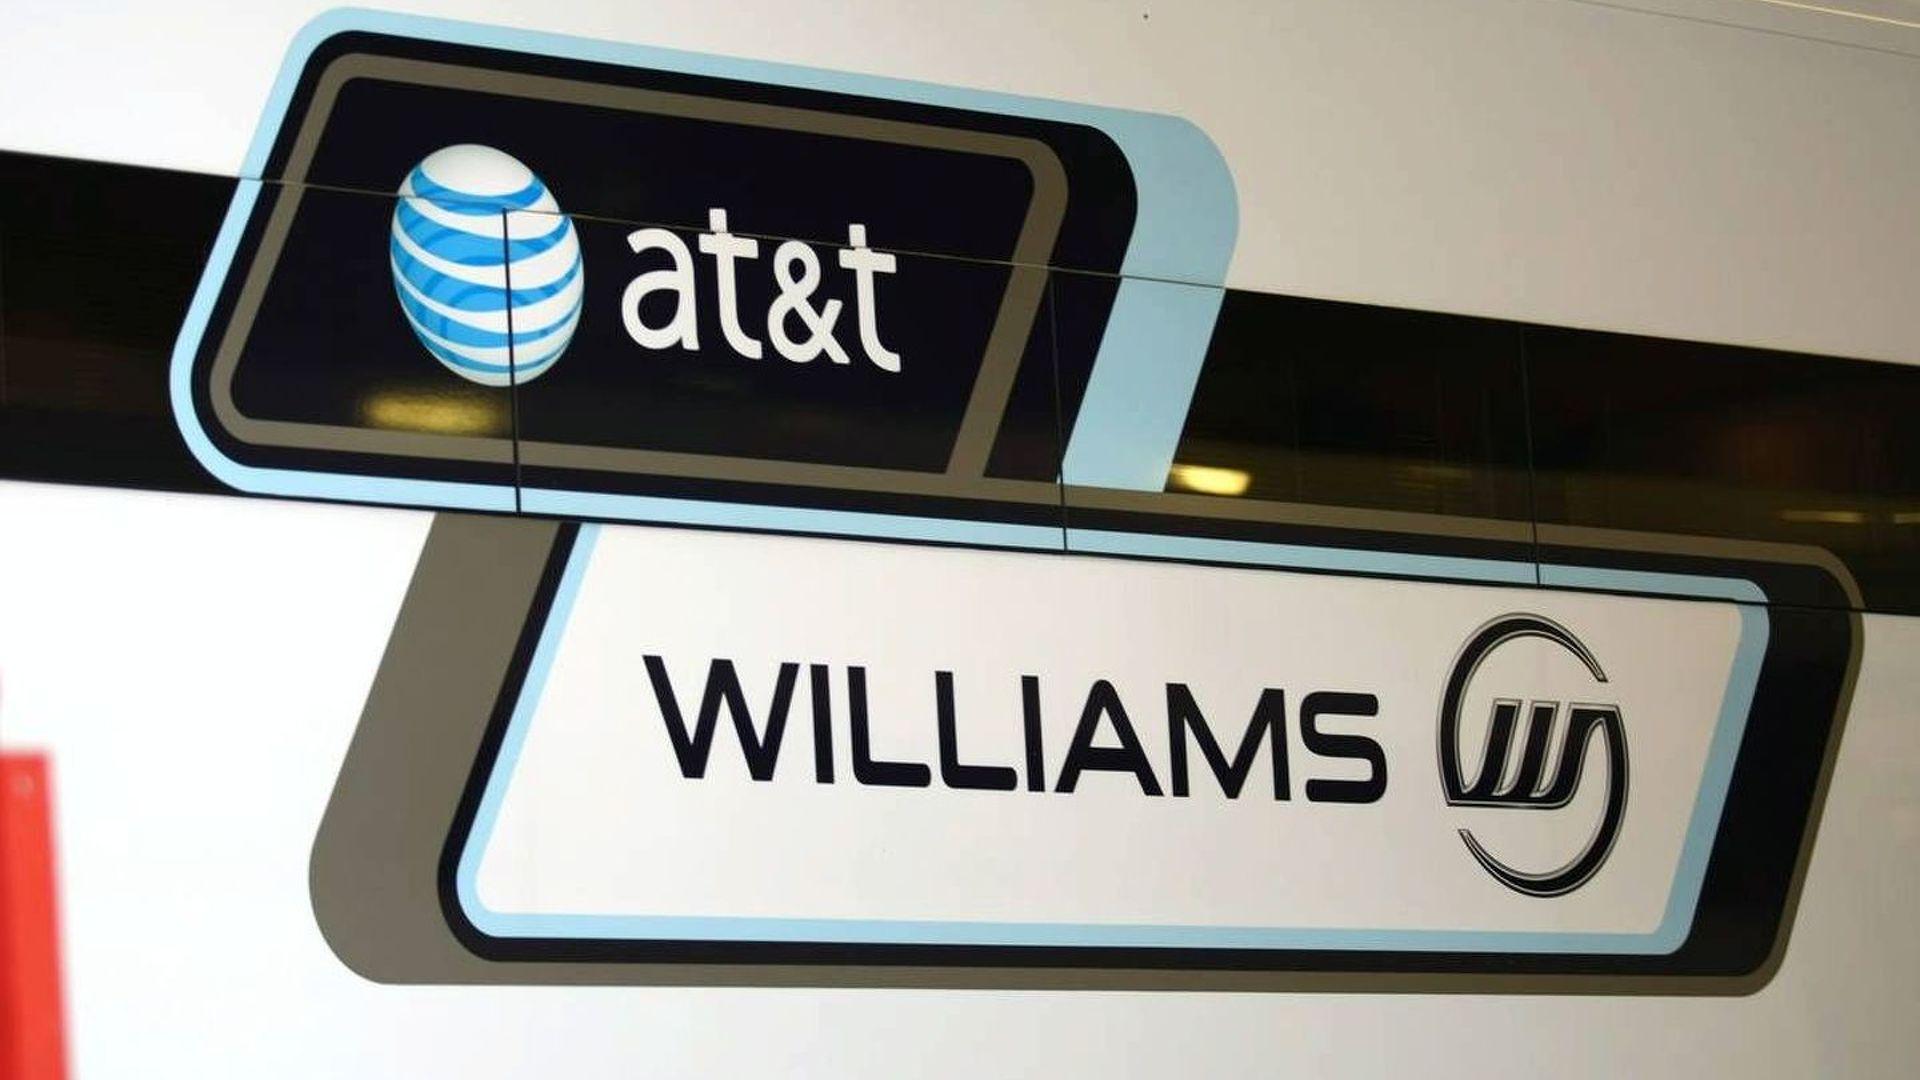 Williams in running for MasterCard sponsorship